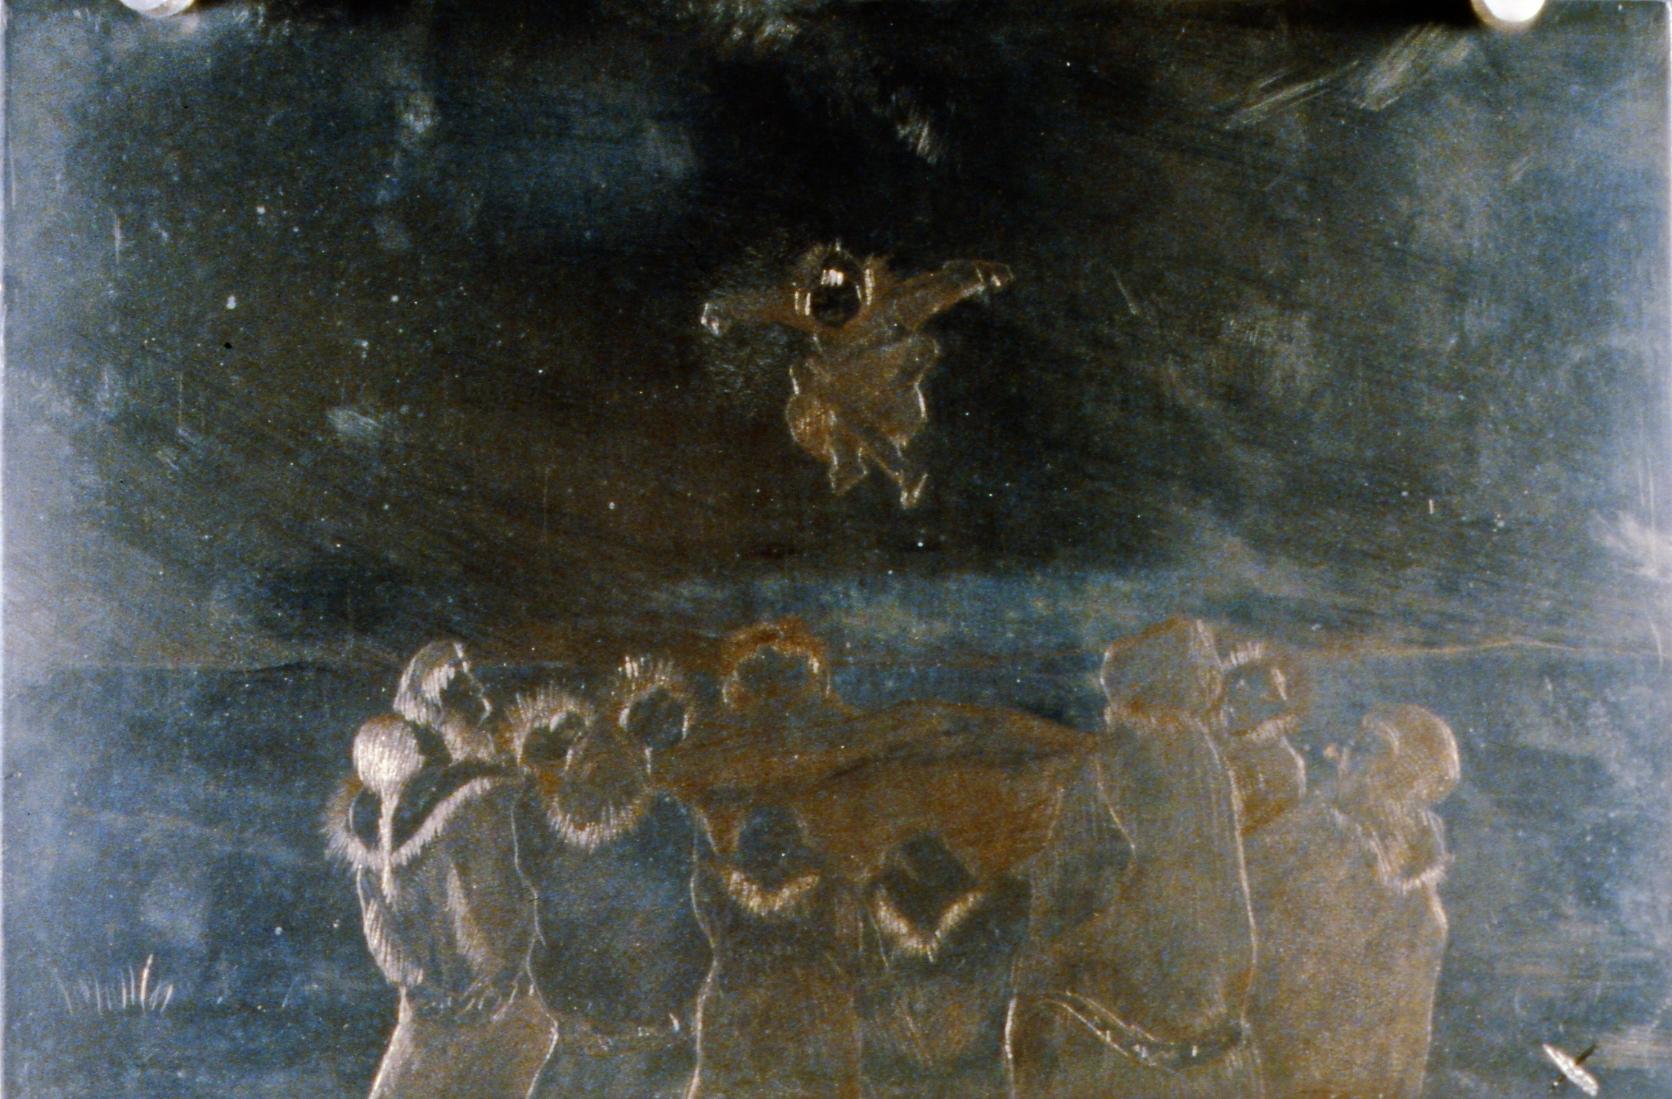 Blanket Toss , 1986, Minn Sjølseth, metal plate, 15 x 22.5 cm, 1996.02.20